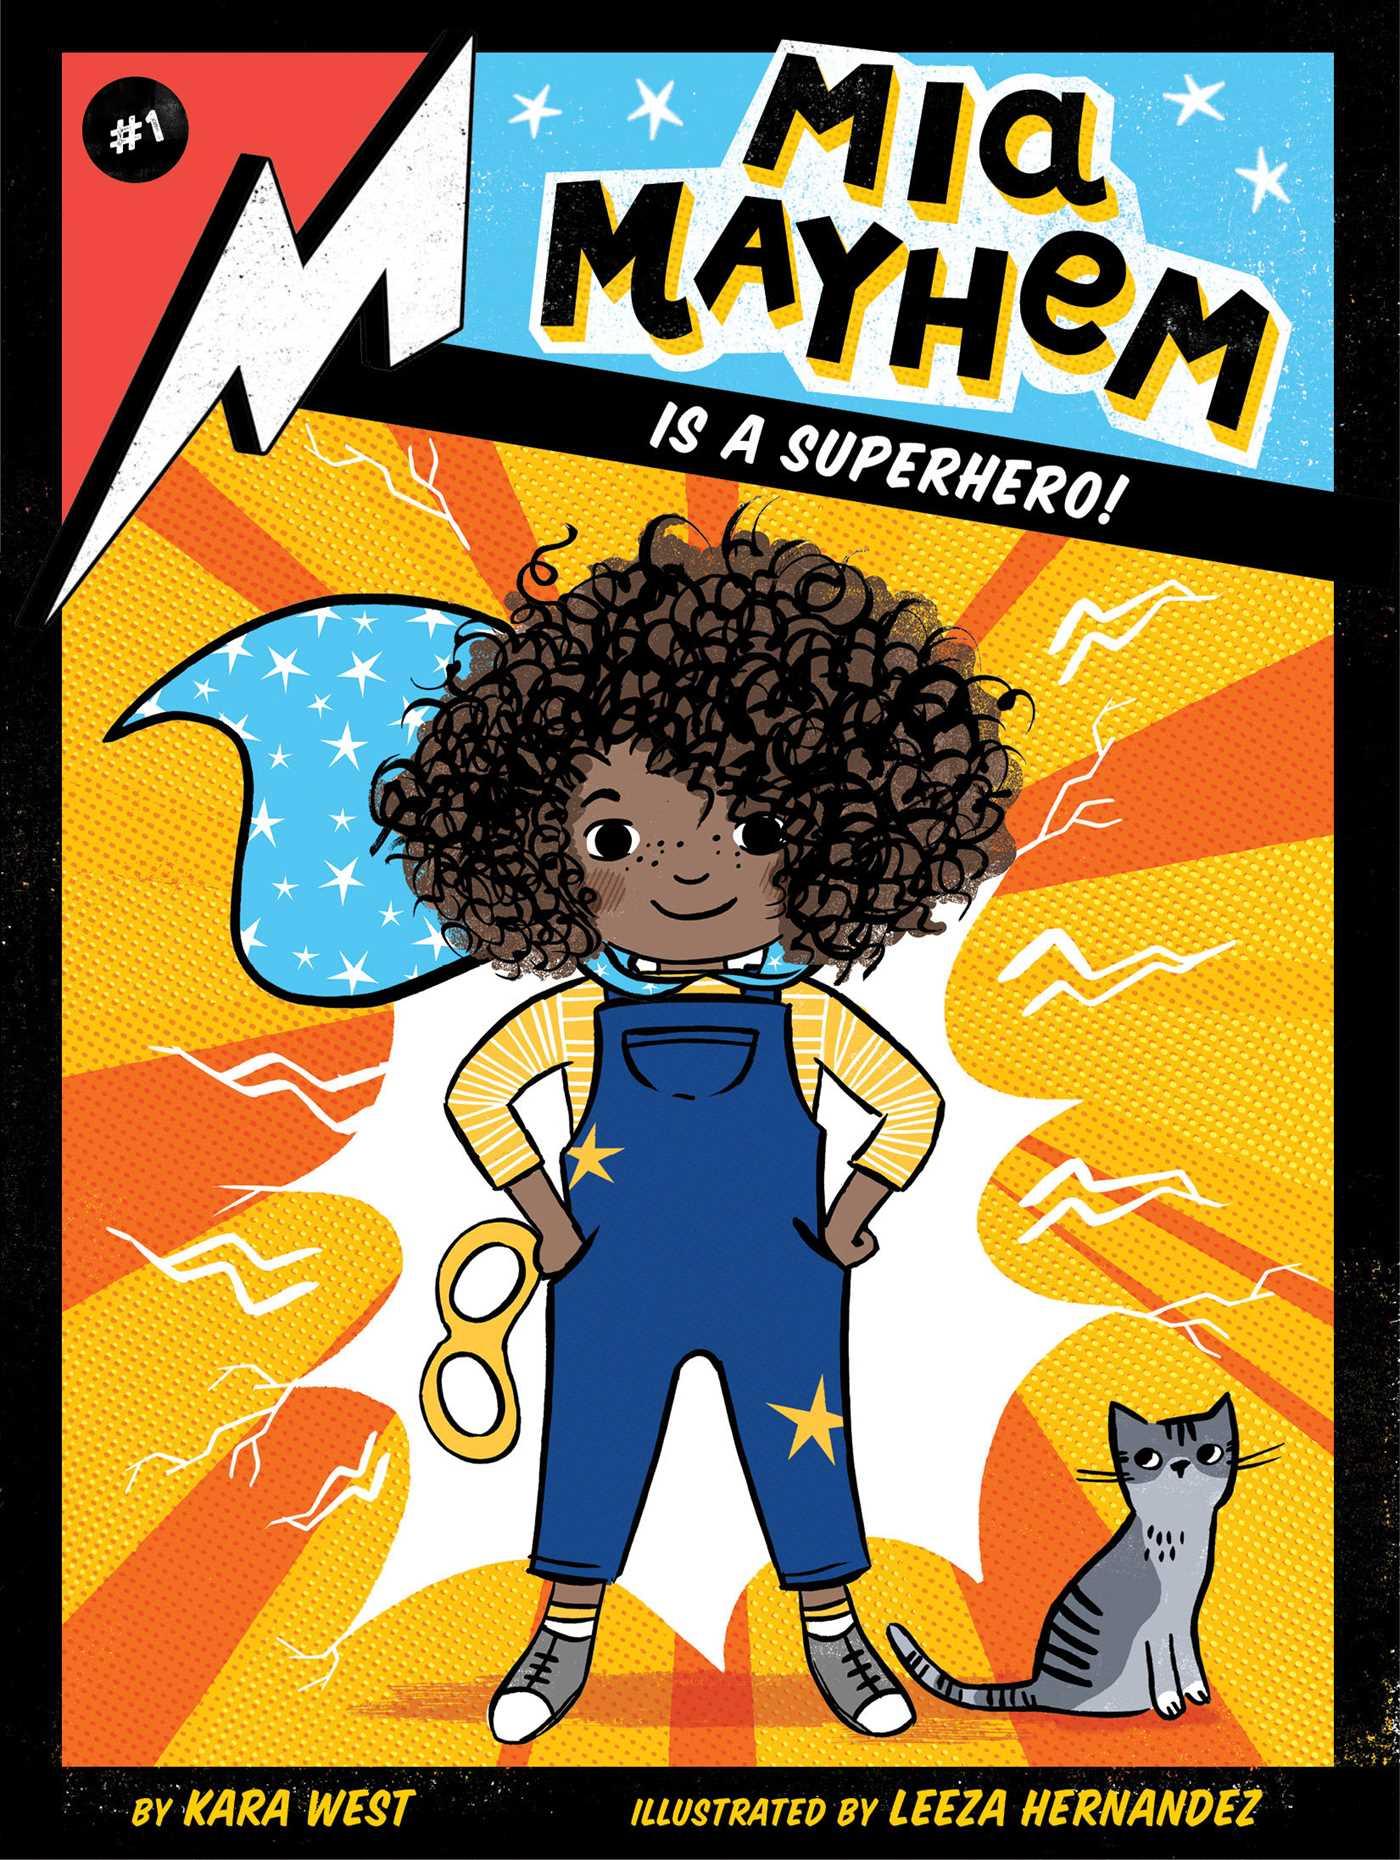 Image result for mia mayhem superhero cover